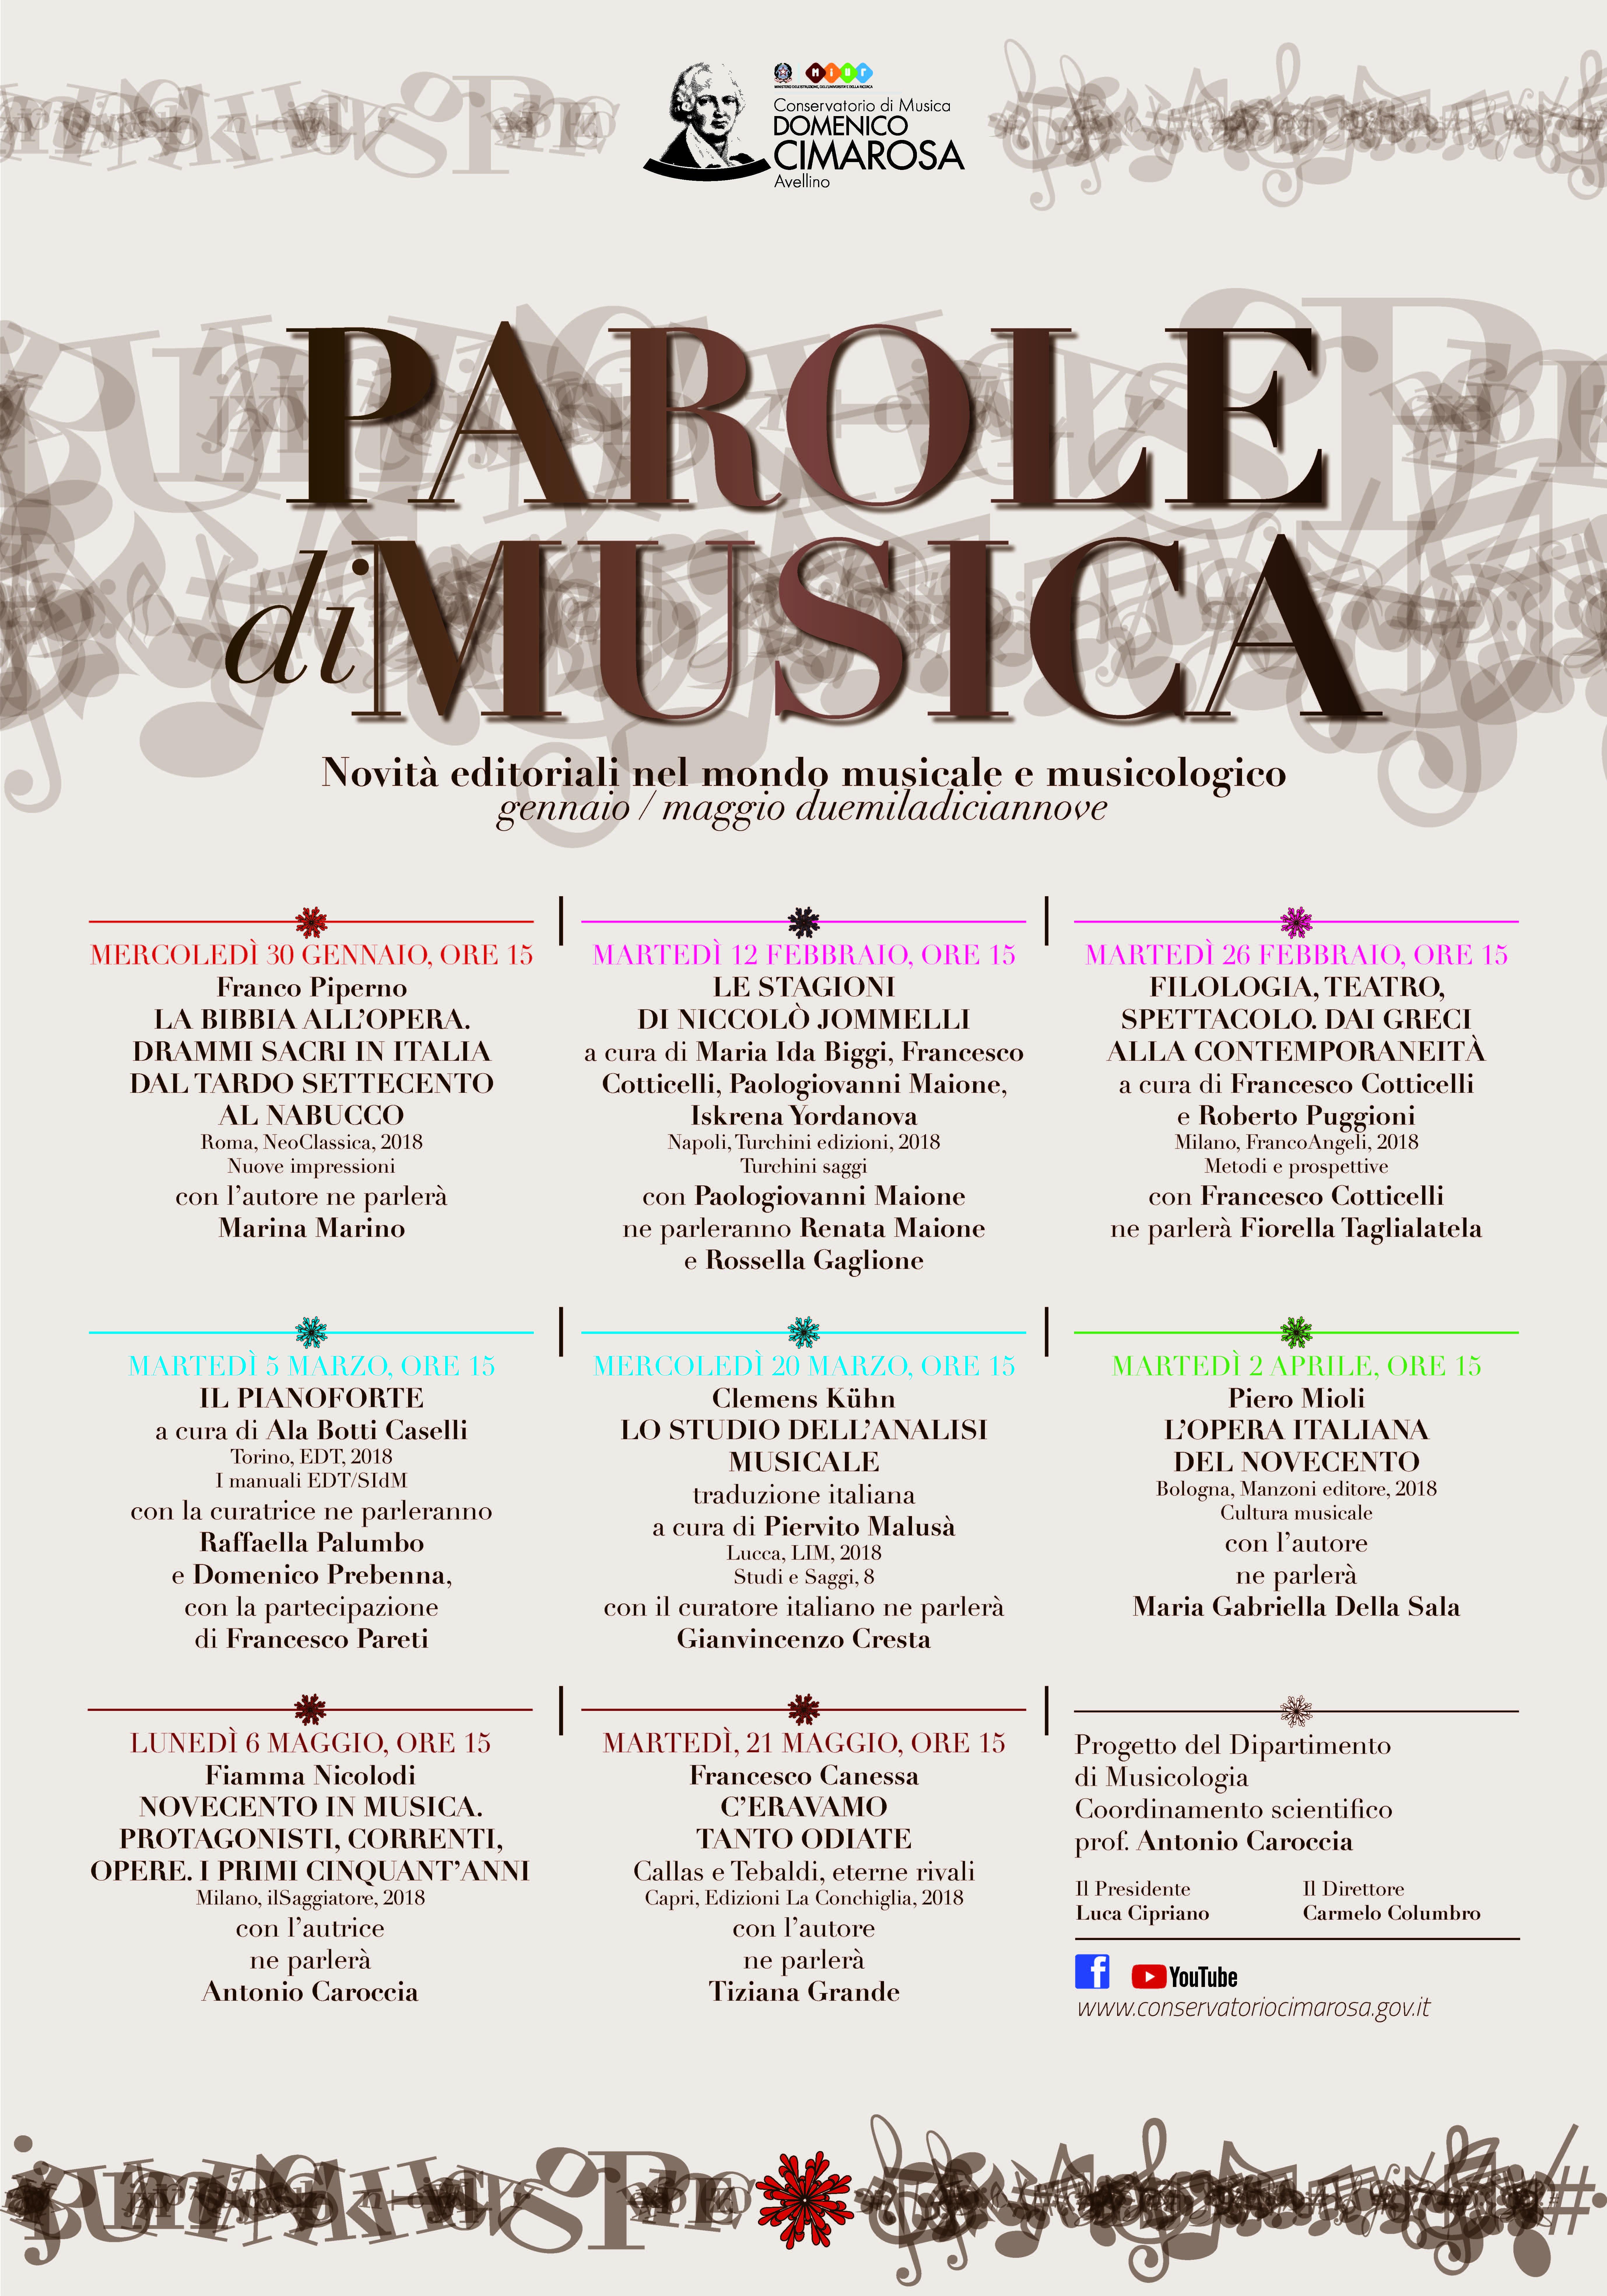 PAROLE DI MUSICA 2019